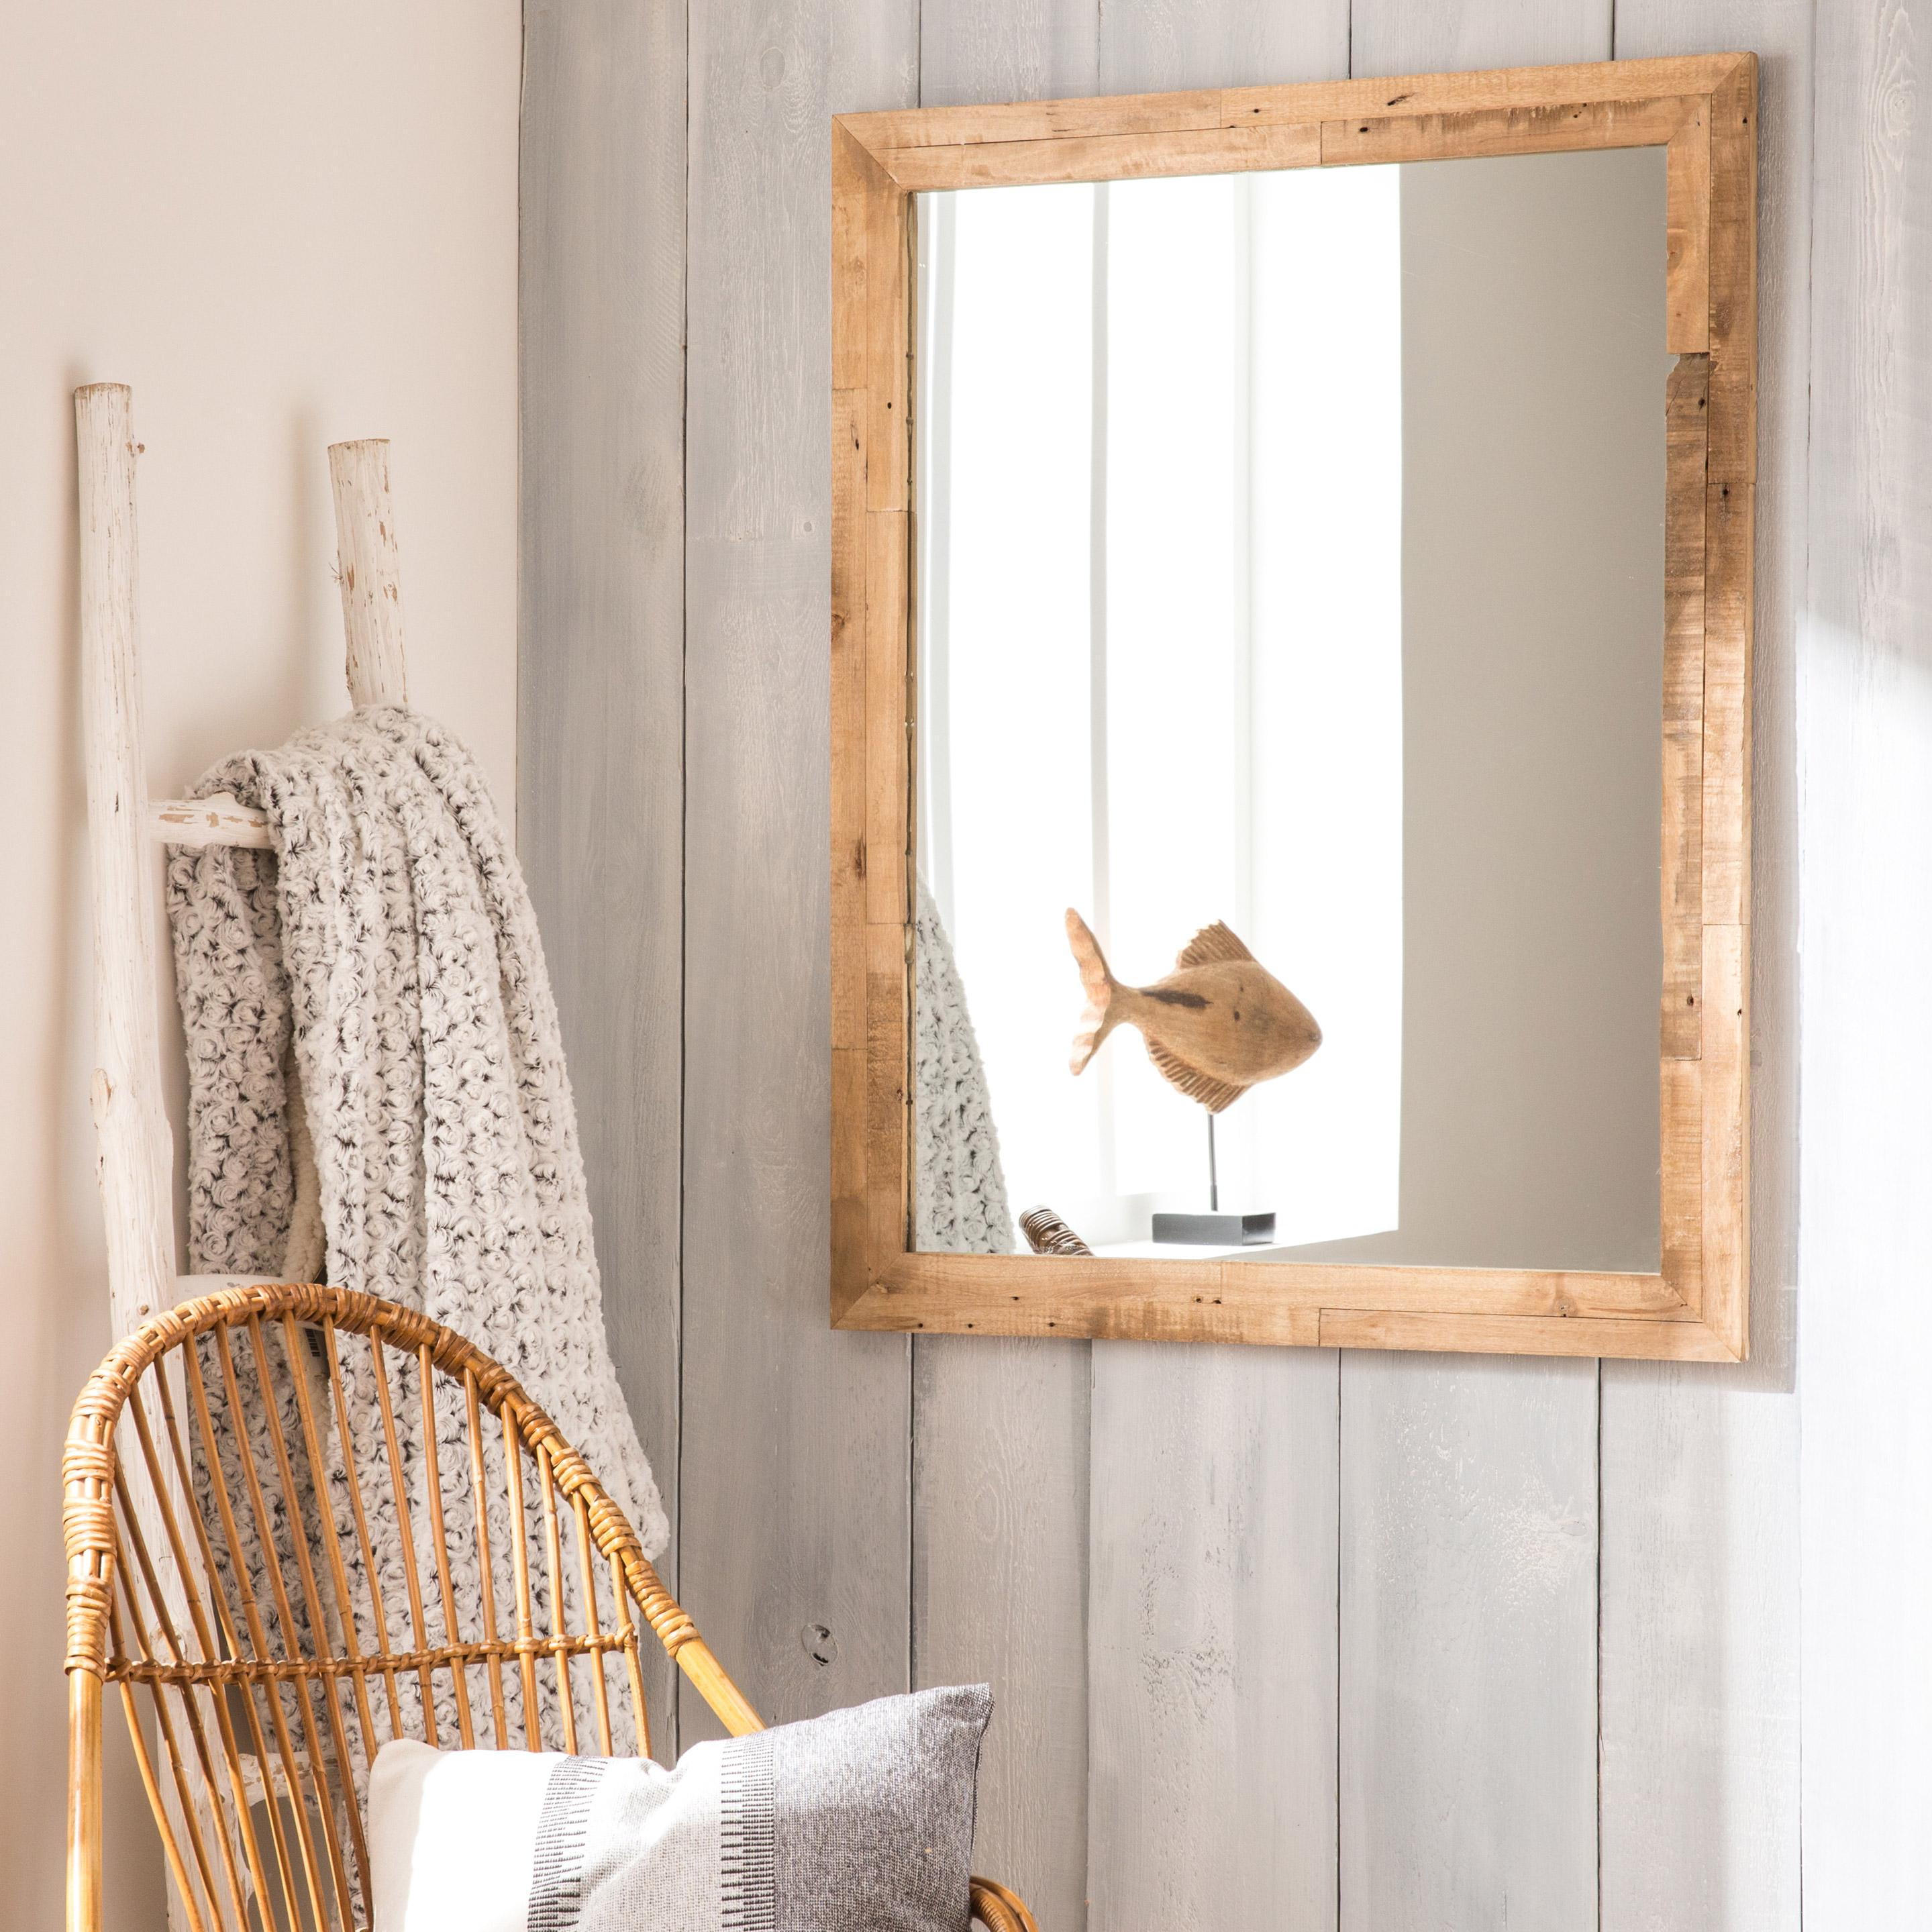 Miroir rectangulaire Brut, naturel, l.71 x H.91 cm